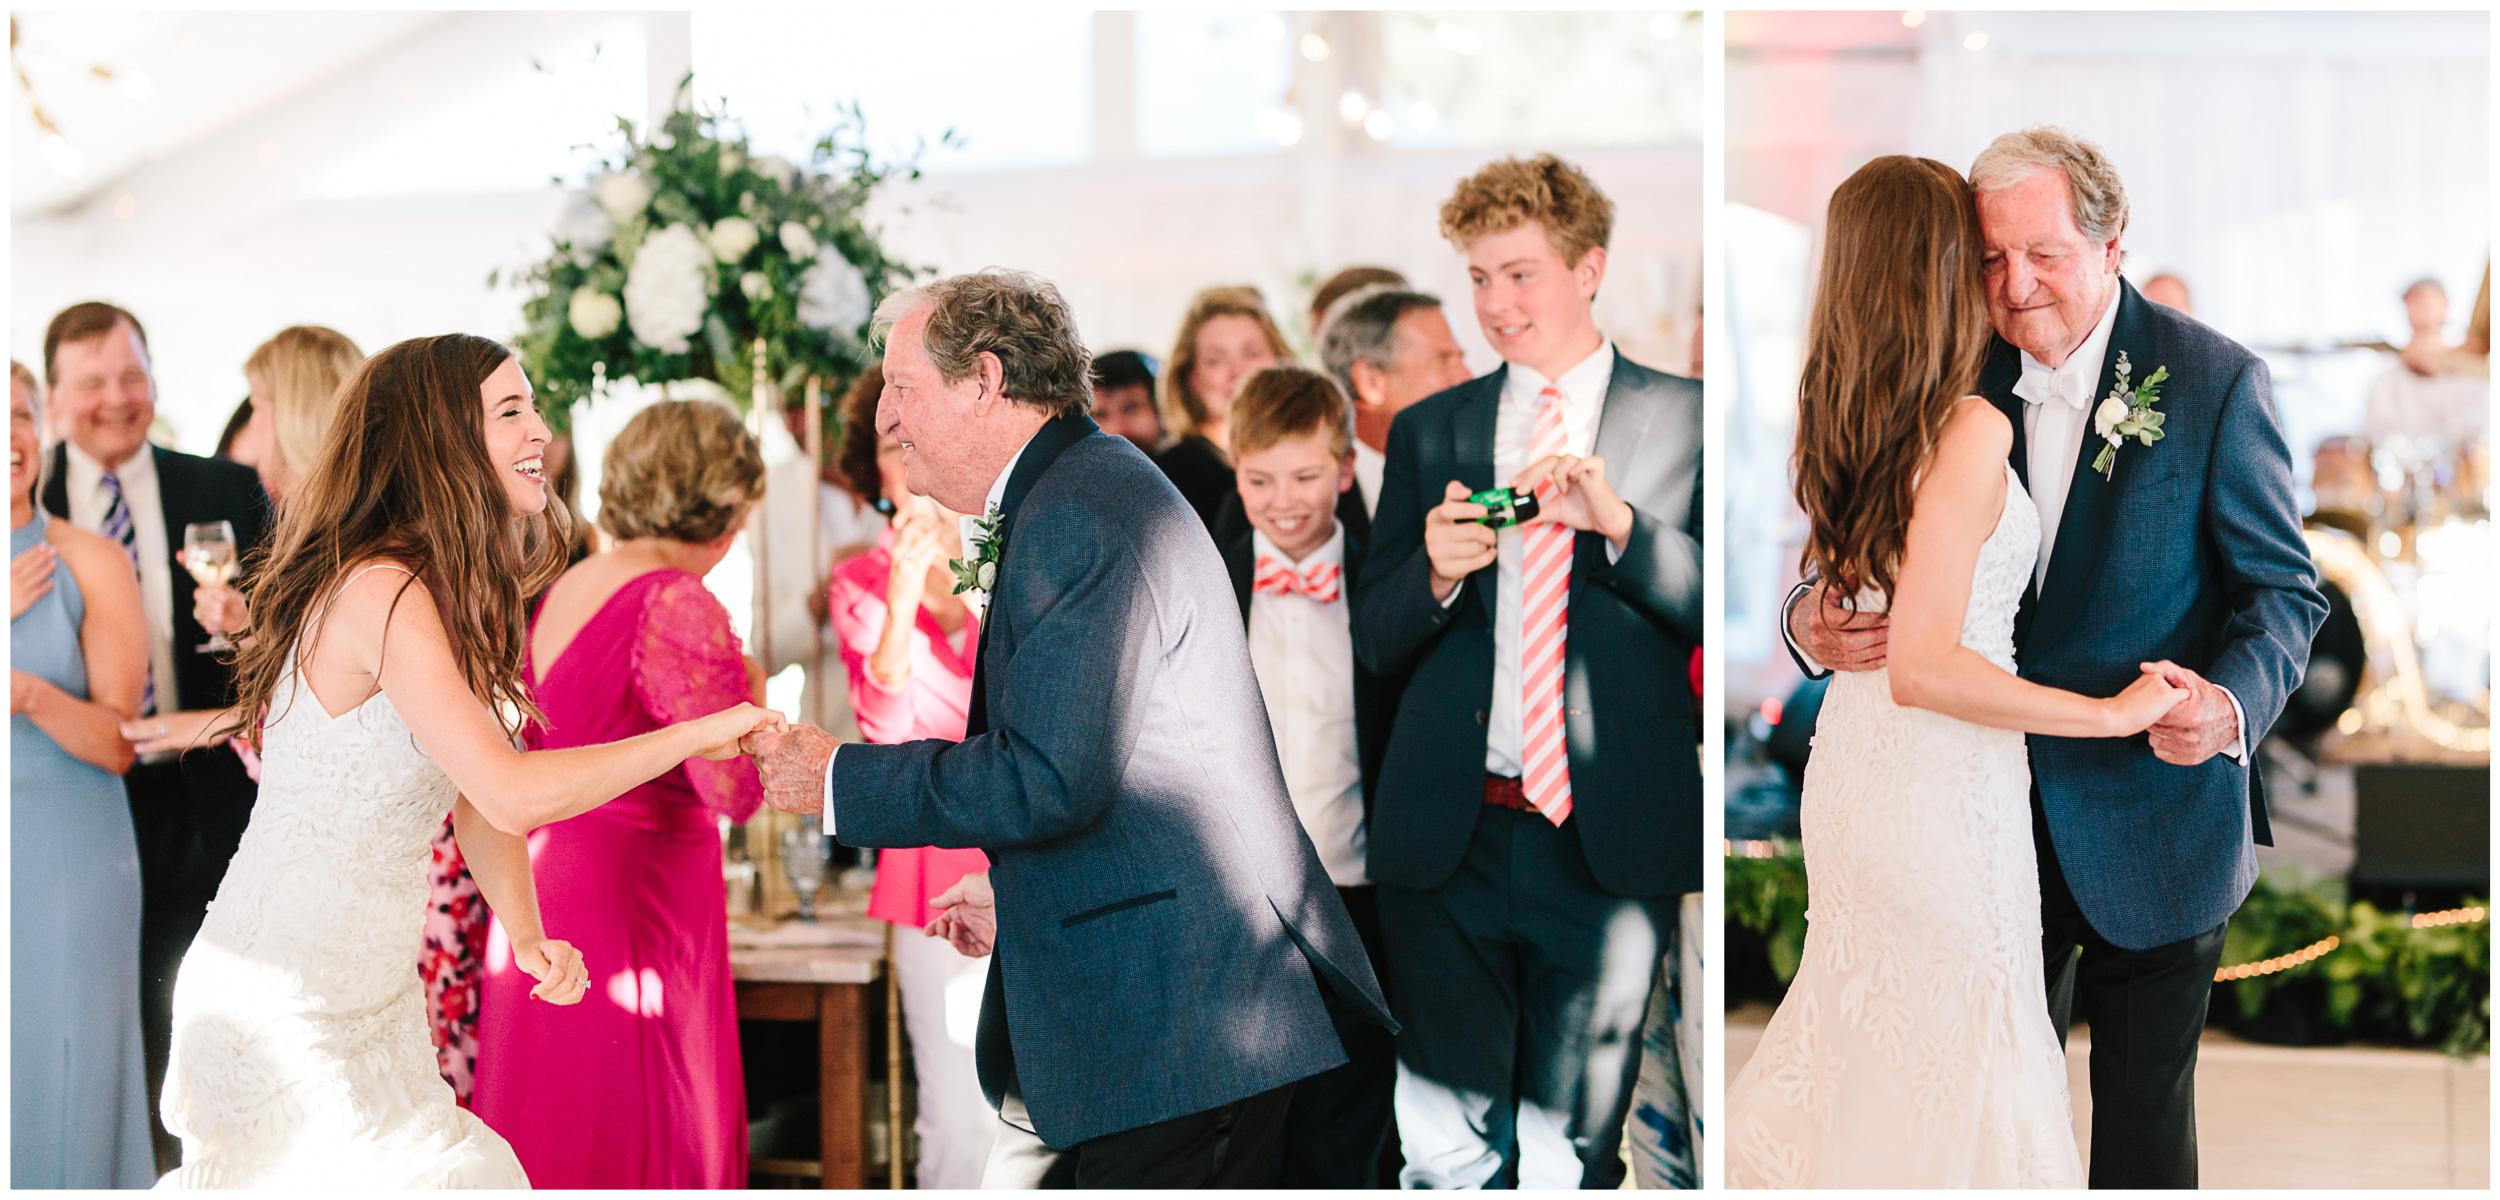 crested_butte_wedding_110.jpg